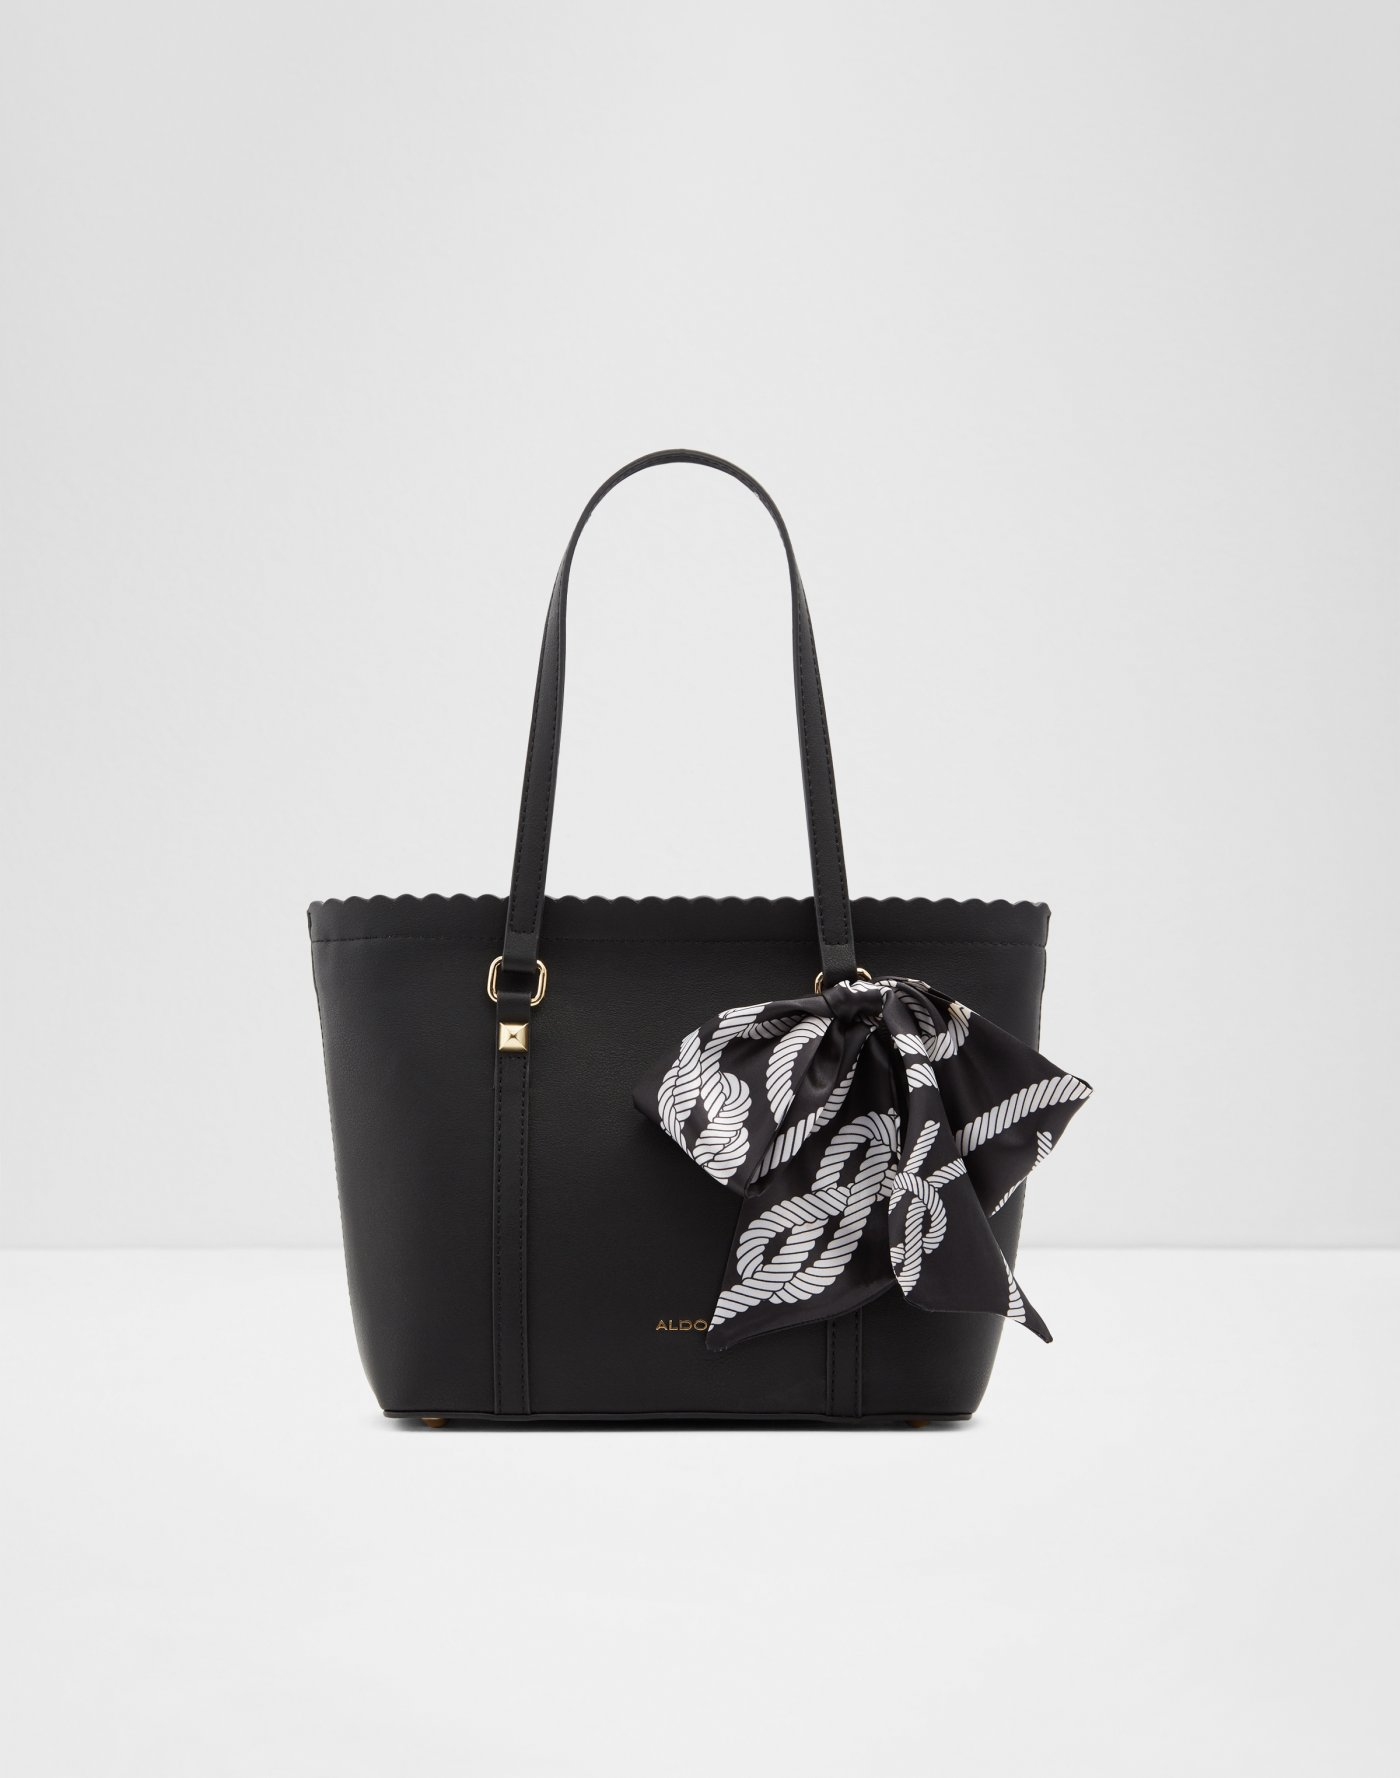 aa1f4ae747e1 All Handbags